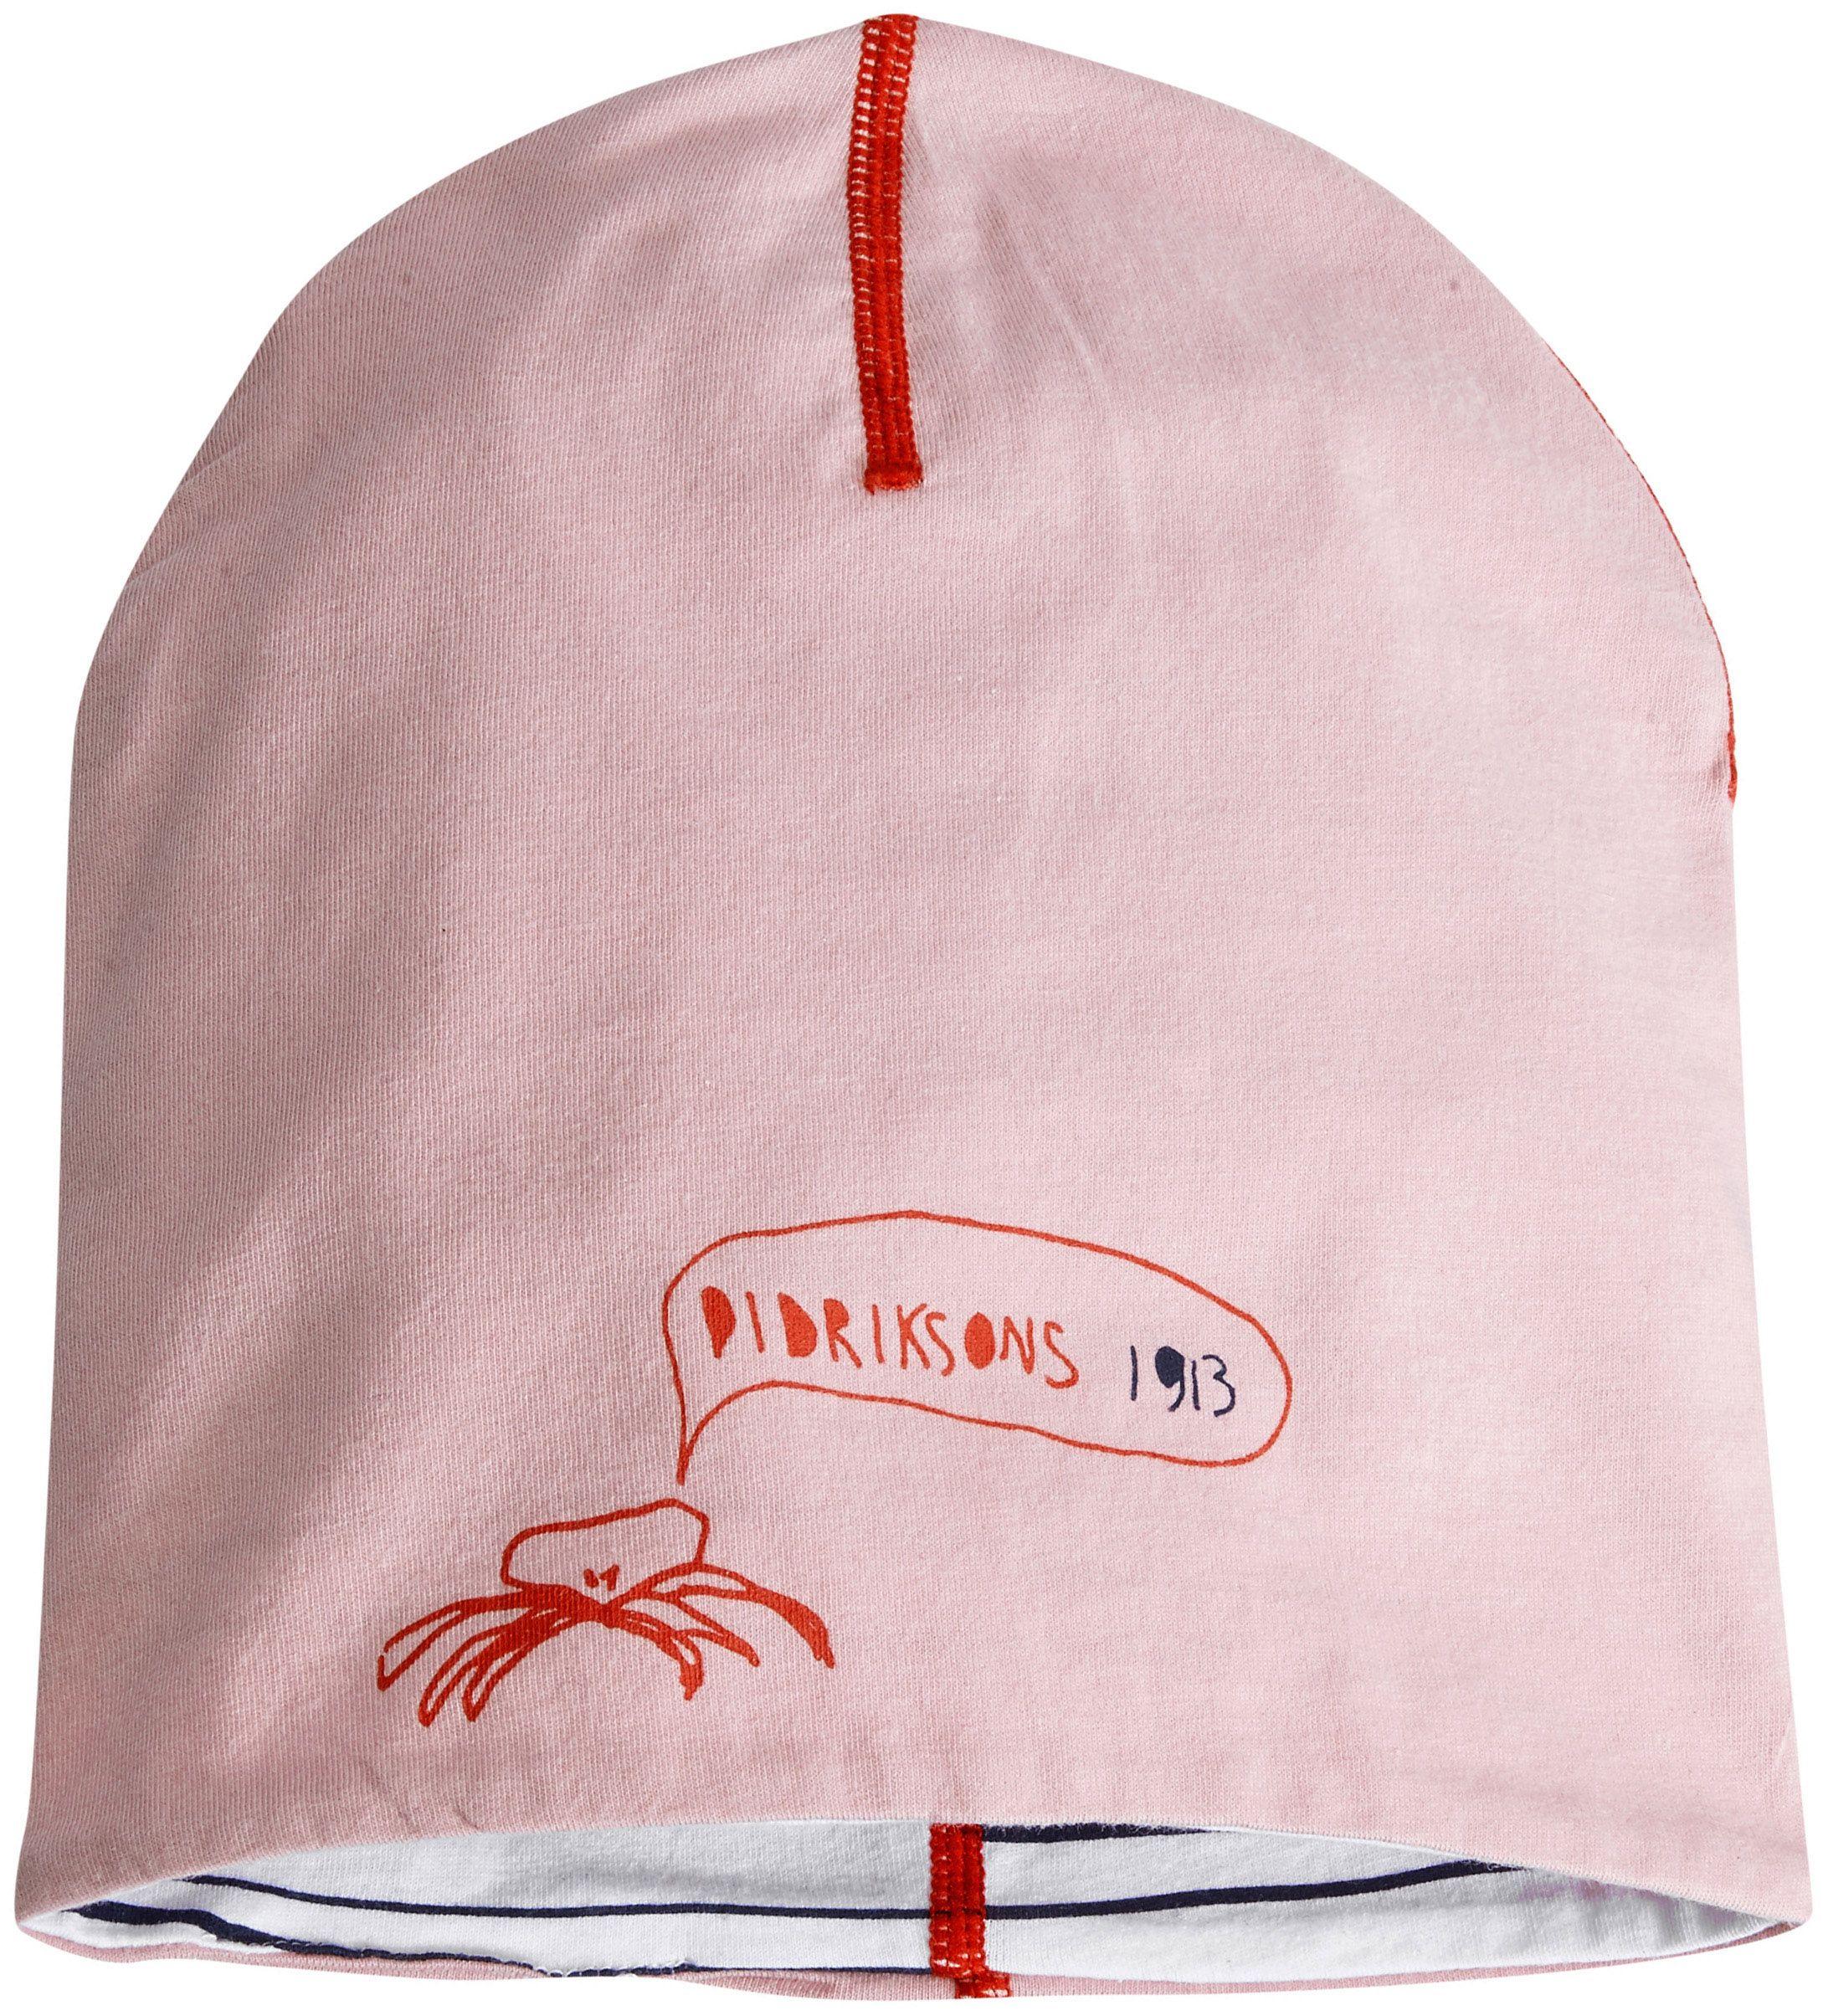 Image of   Vendbar beanie fra Didriksons - Musslan - Dusty Pink / Stripe